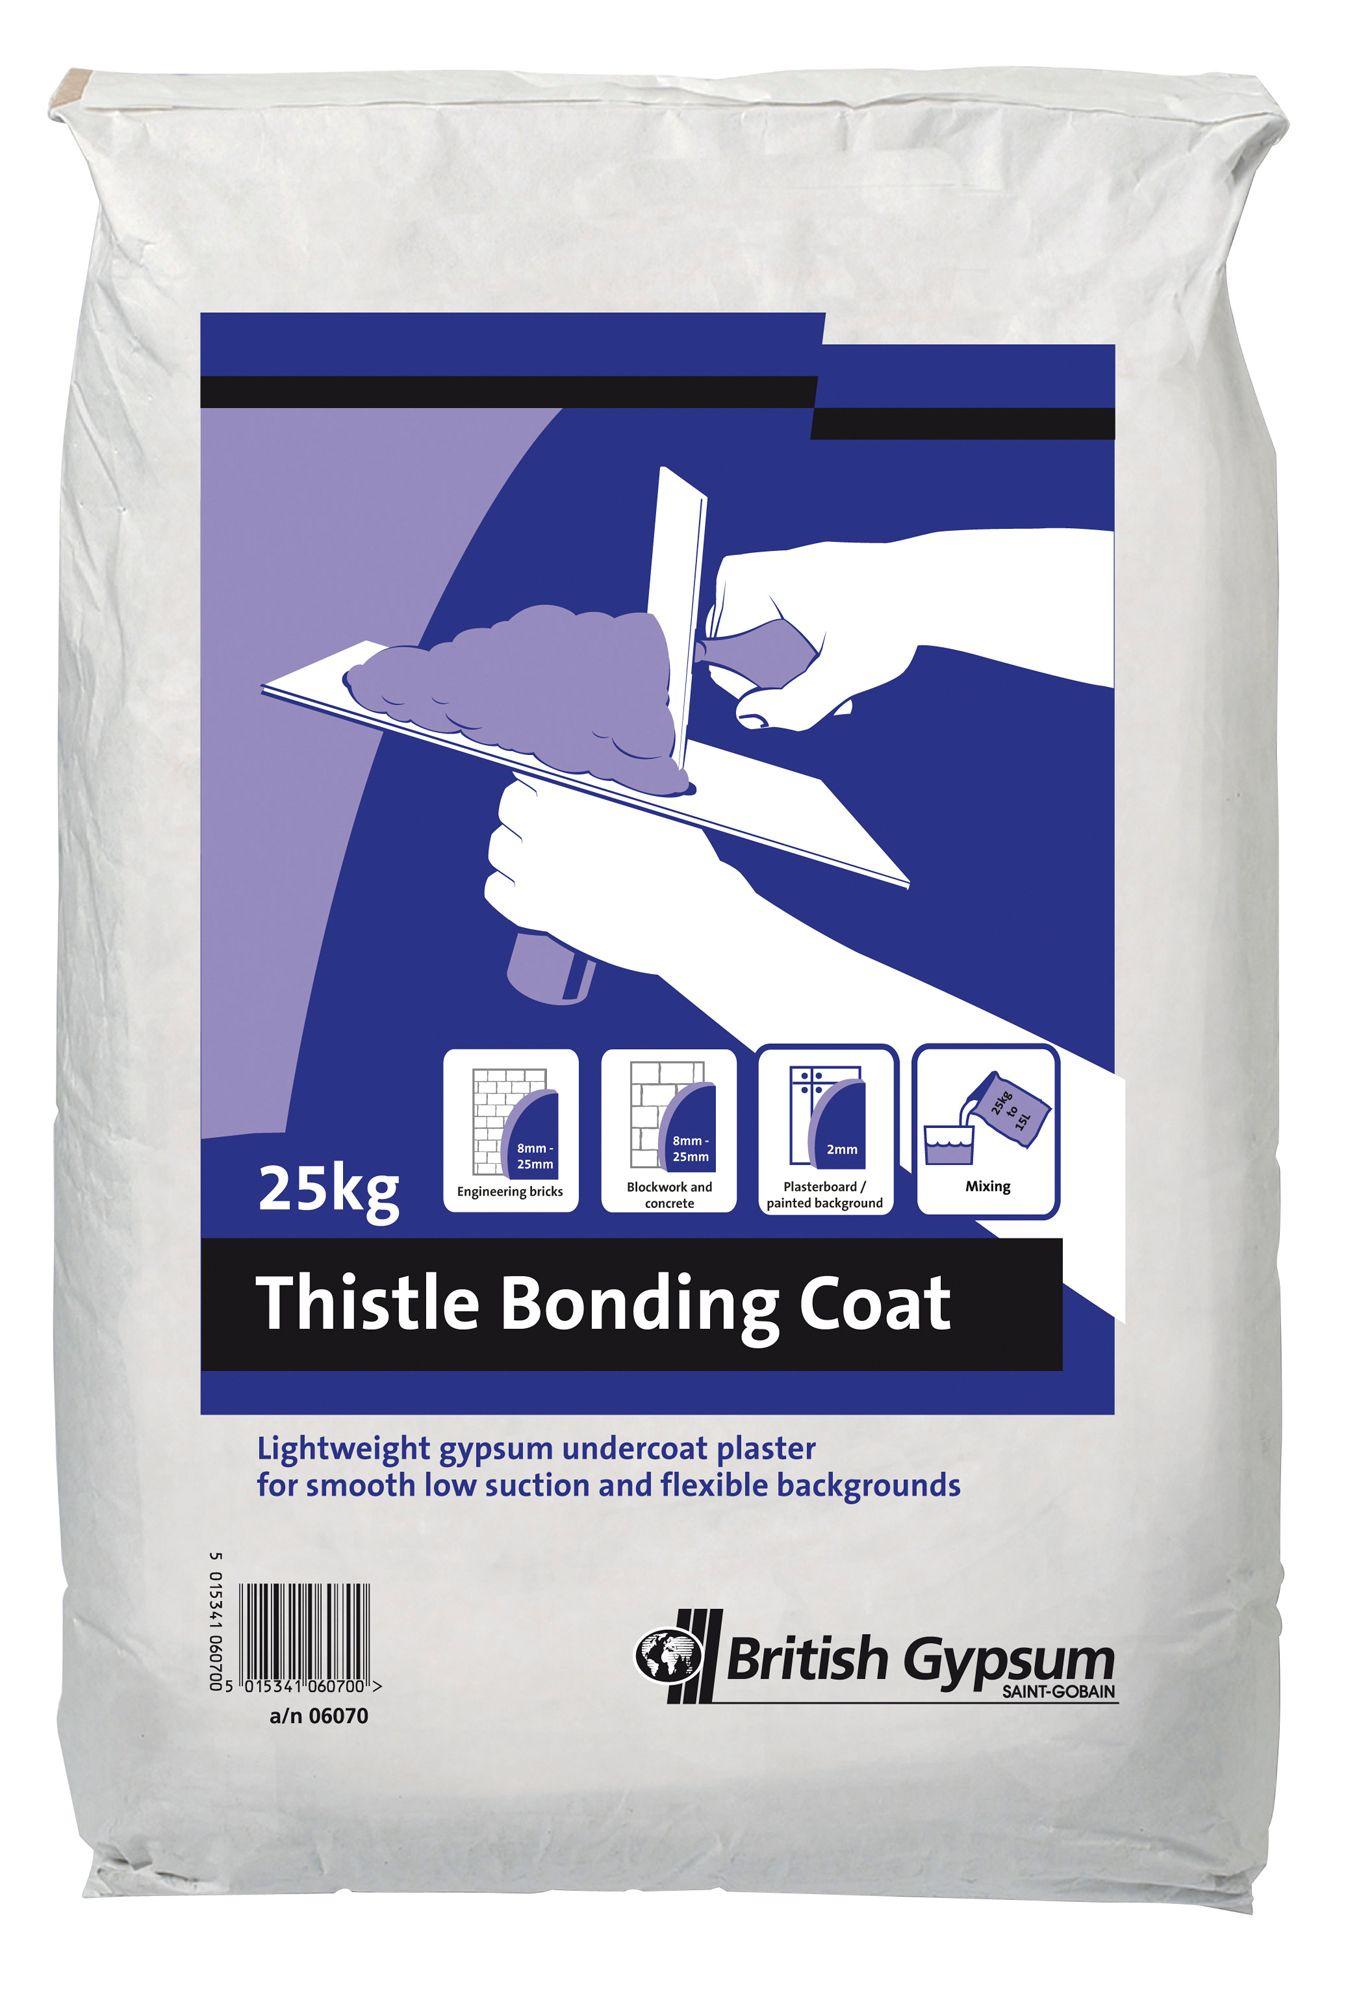 Pallet Of British Gypsum Thistle Bonding Coat Undercoat